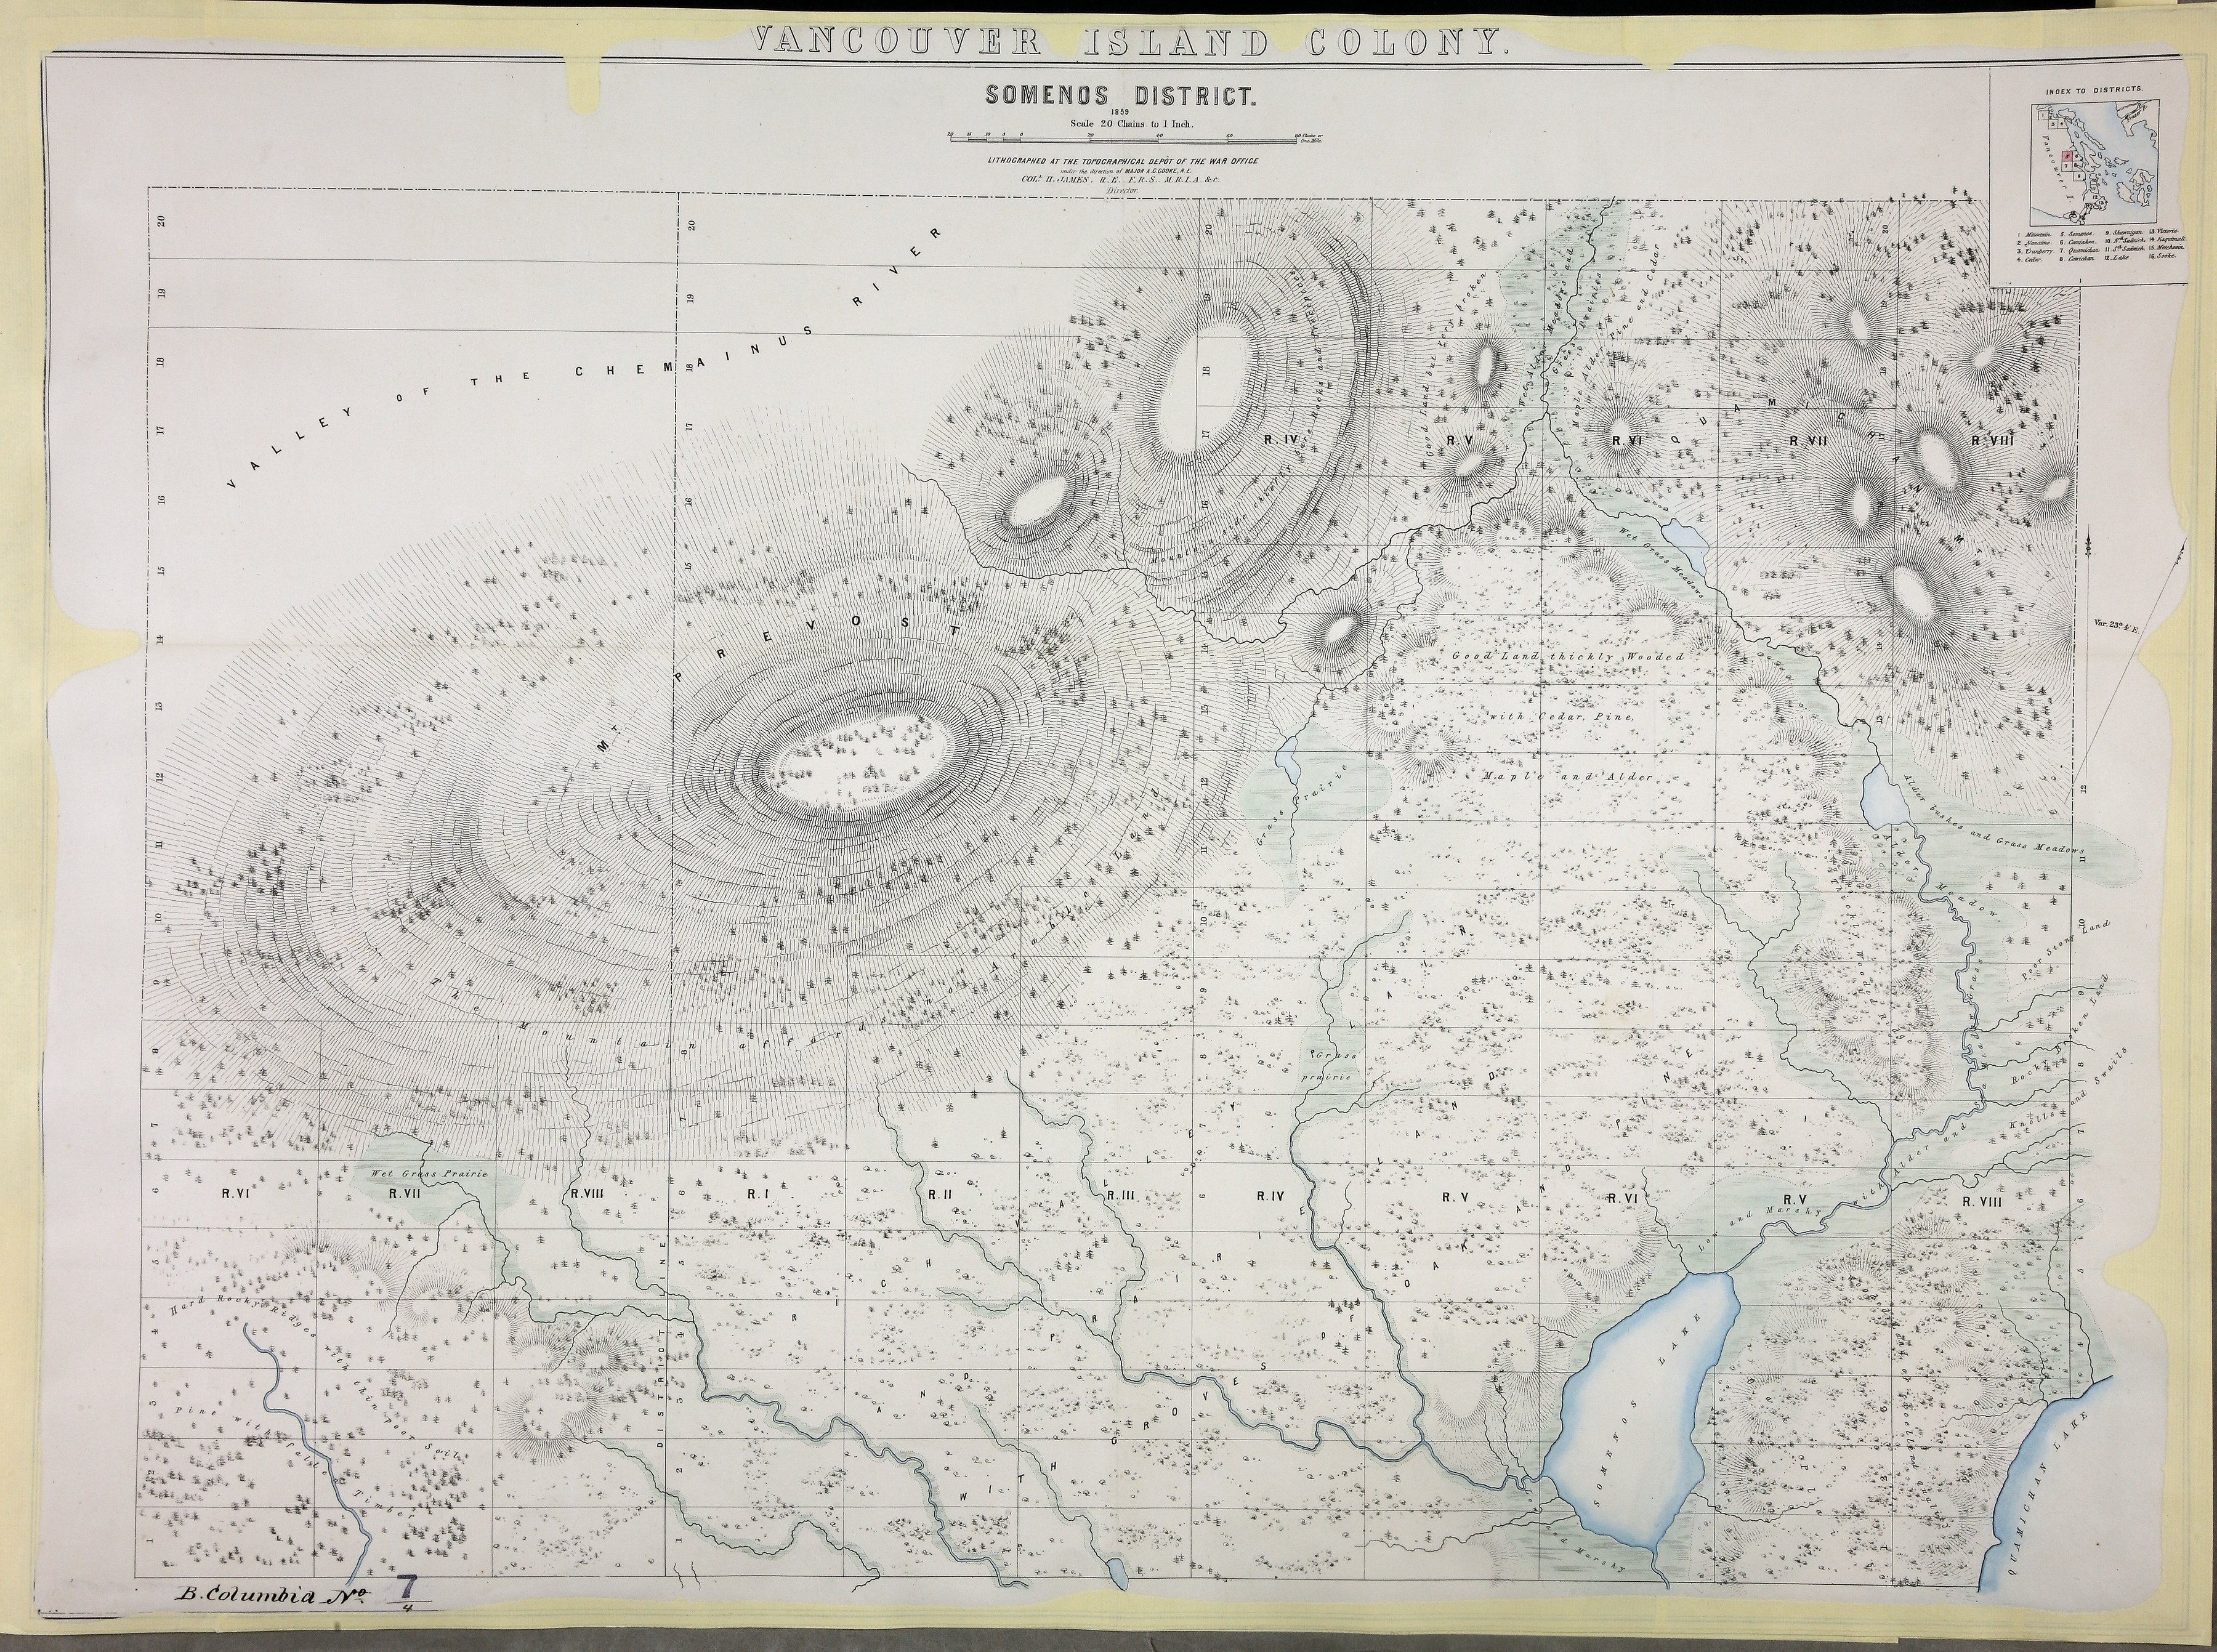 Somenos District 1859.